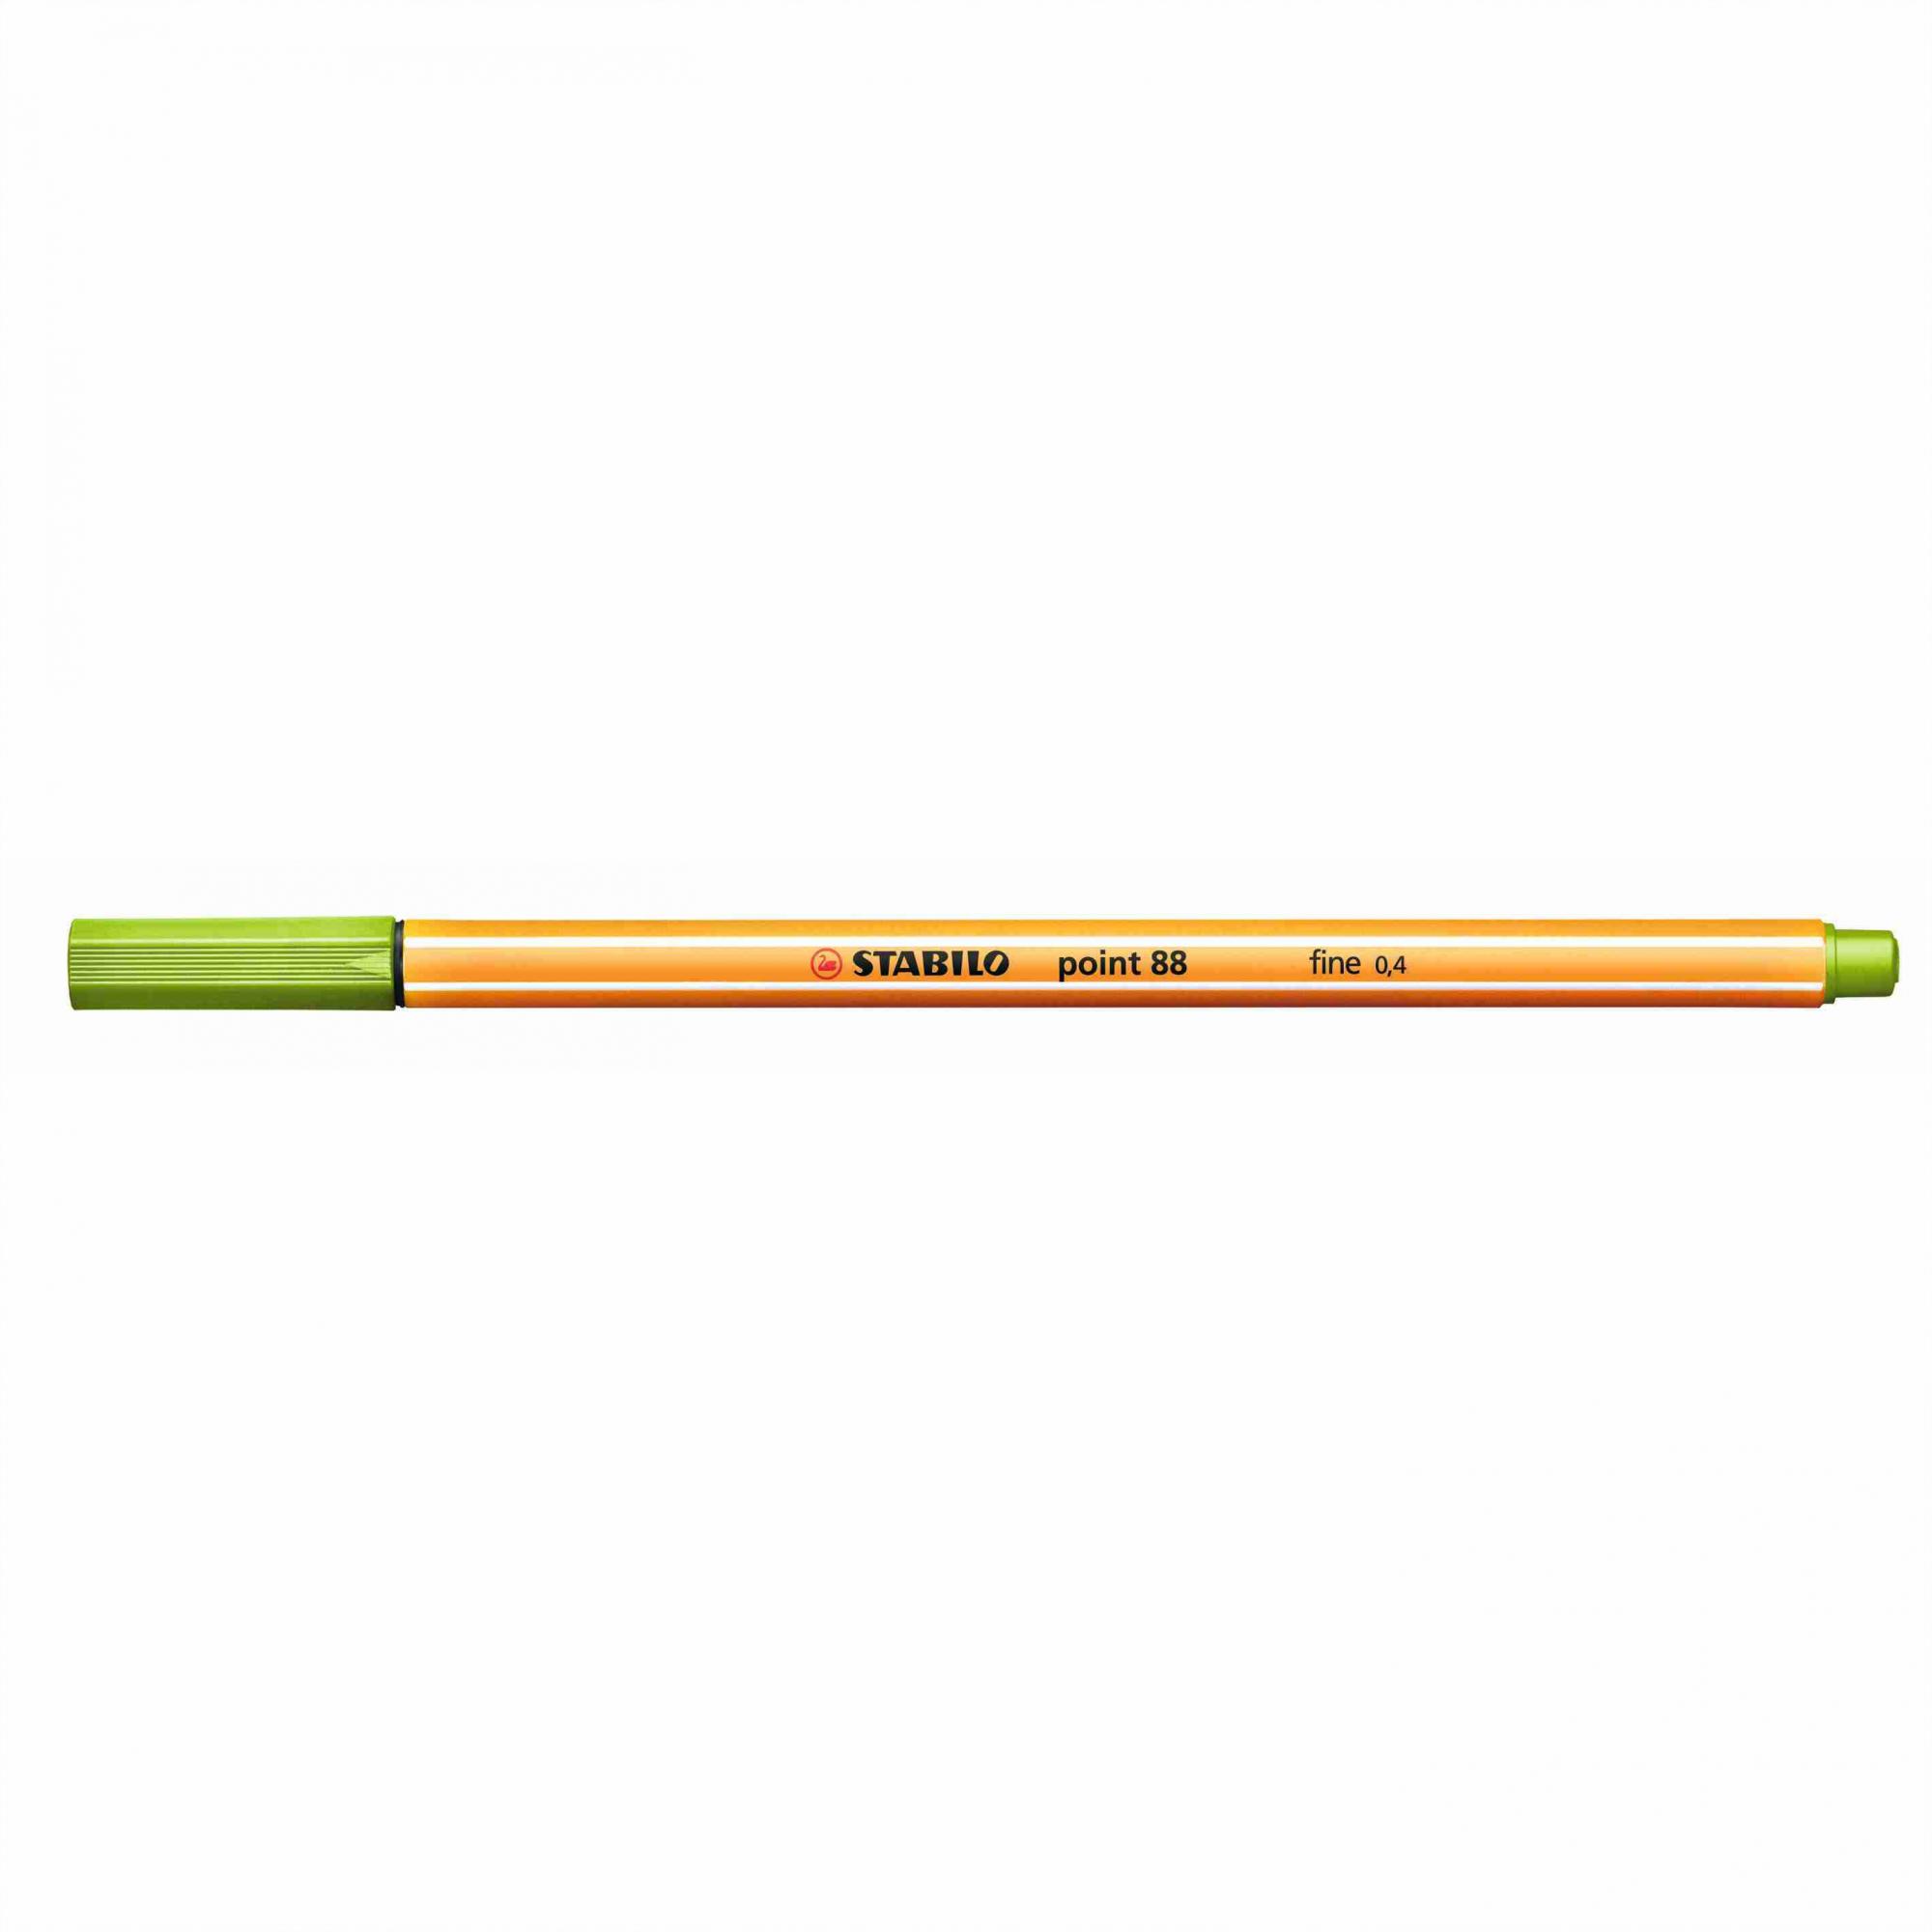 Caneta Hidrográfica 0.4 verde maça POINT 88 Stabilo